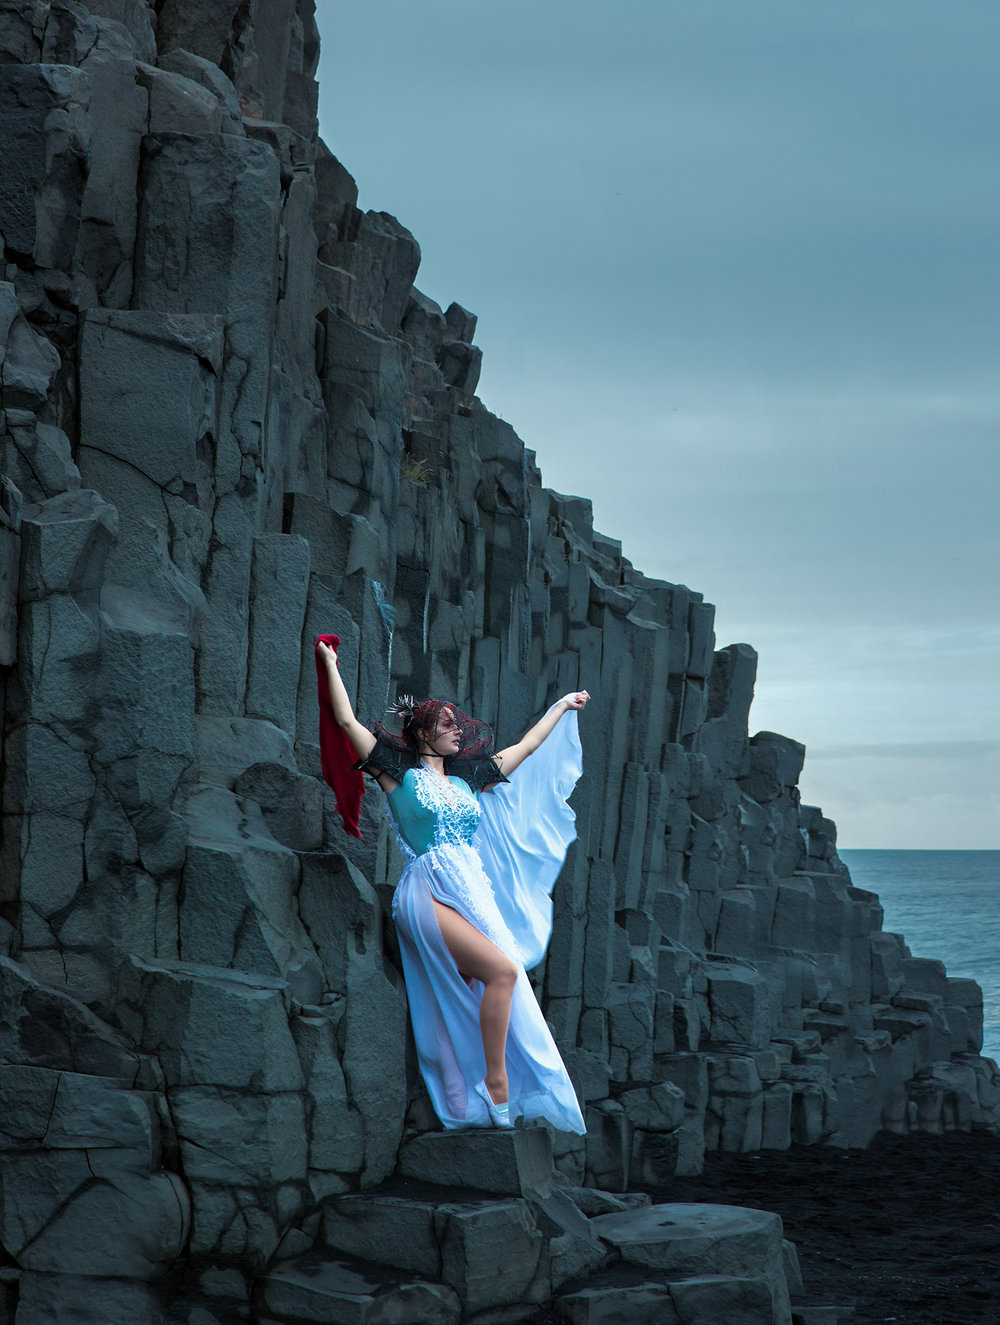 Grace-Almera-Iceland-Free-Spirit-Team-melting-glaciers-Rubis-Harley.jpg